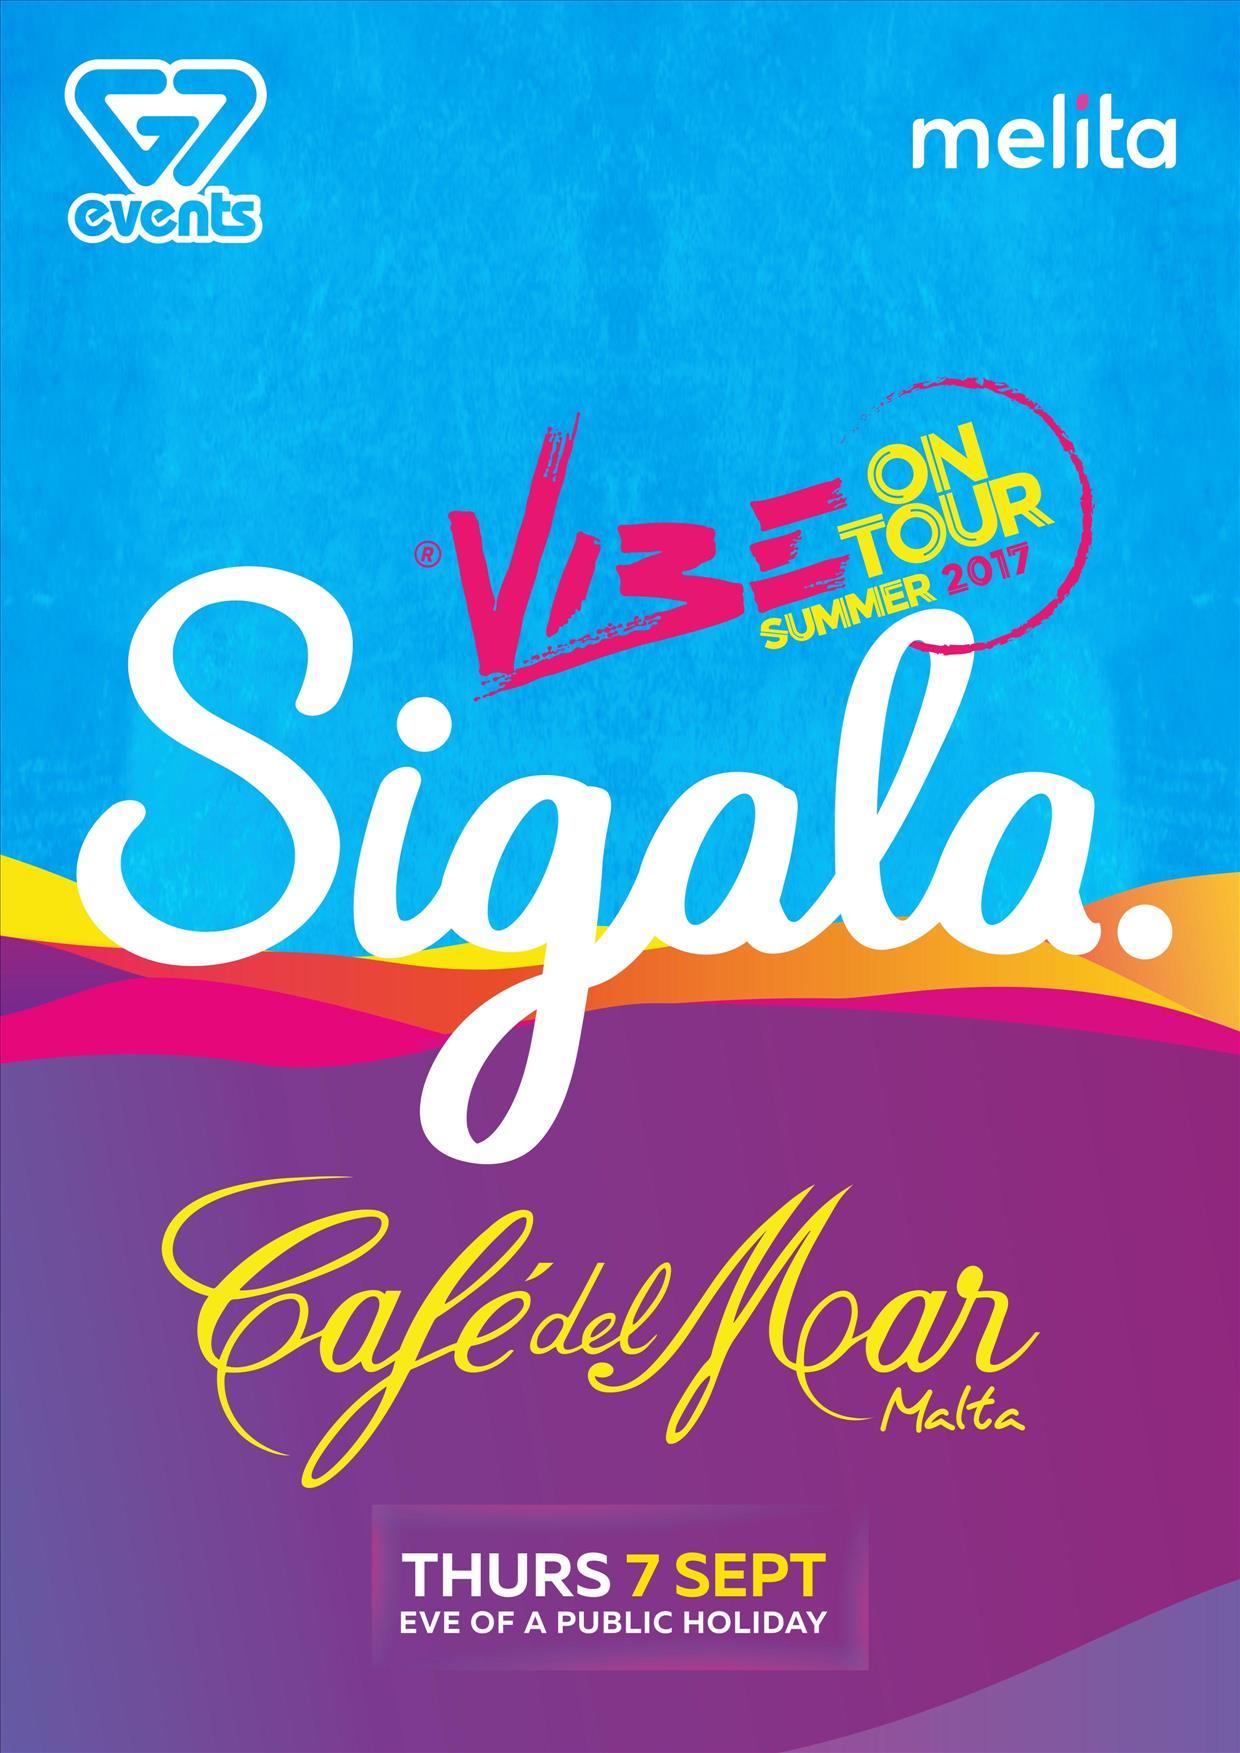 Vibe on Tour ft: SIGALA at Café Del Mar - 07.09.17 flyer